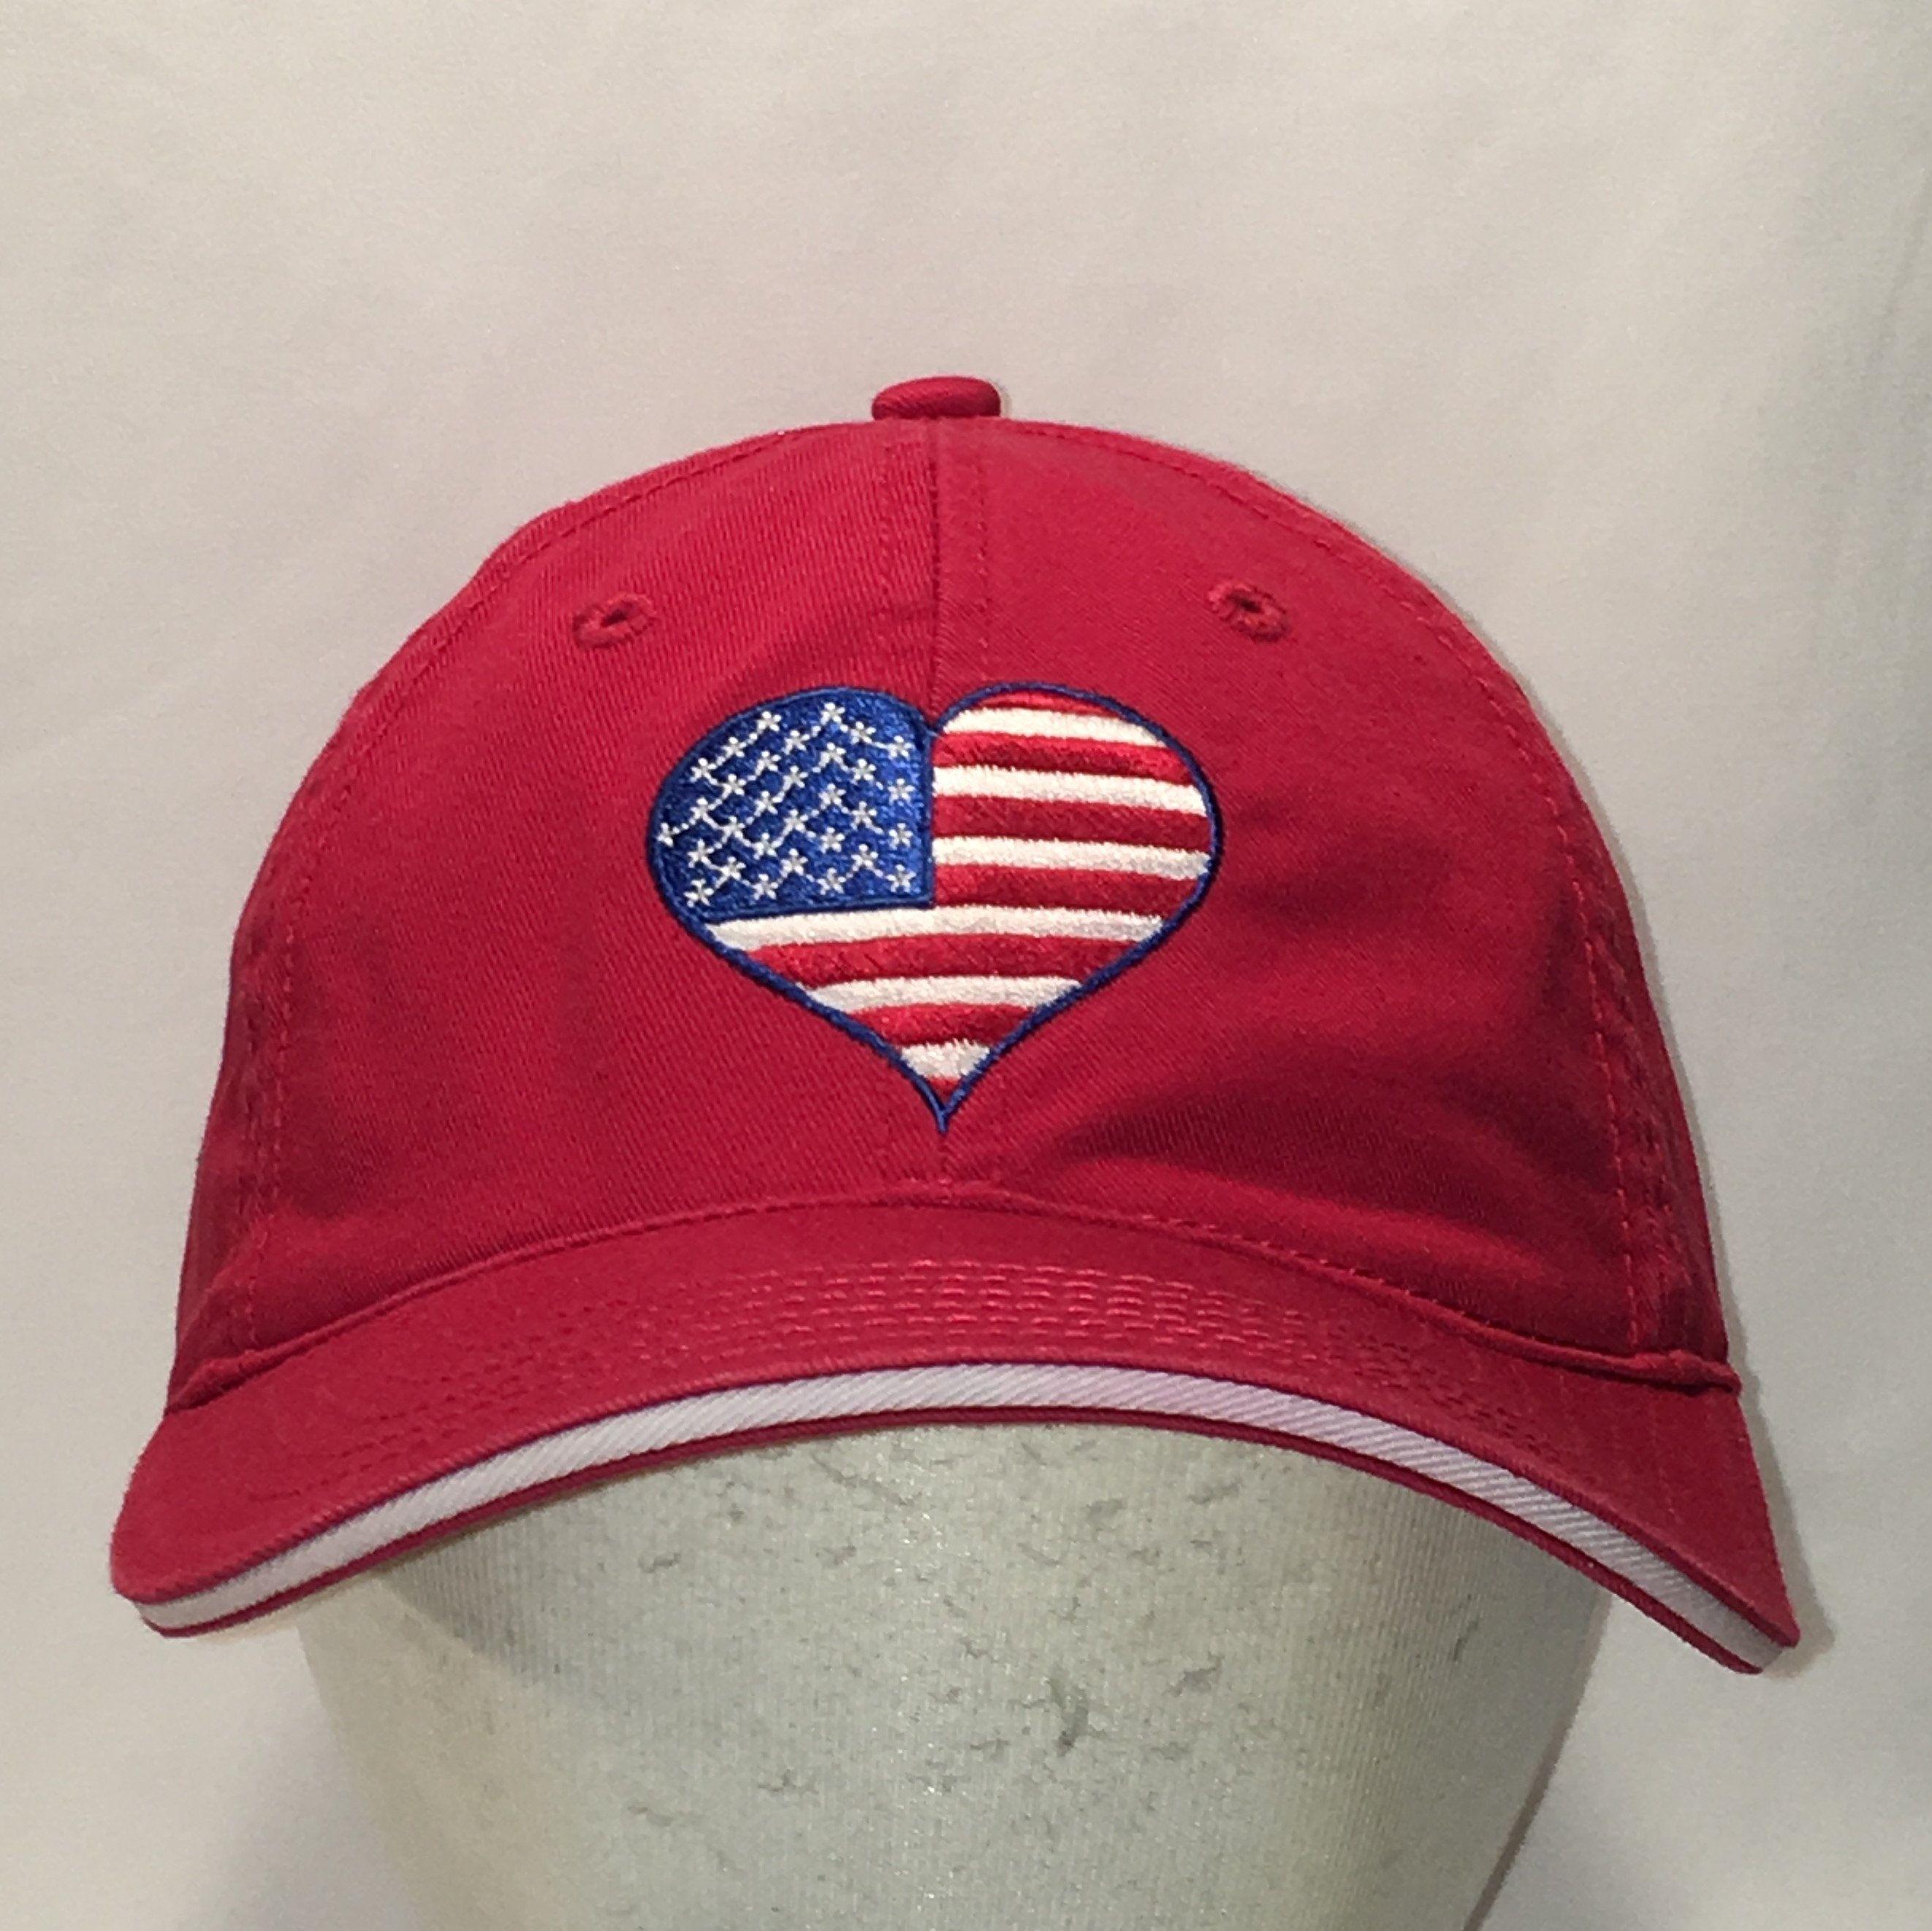 c53496f2c American Flag Hat Red White Blue Baseball Cap Womens Hats Love Heart ...